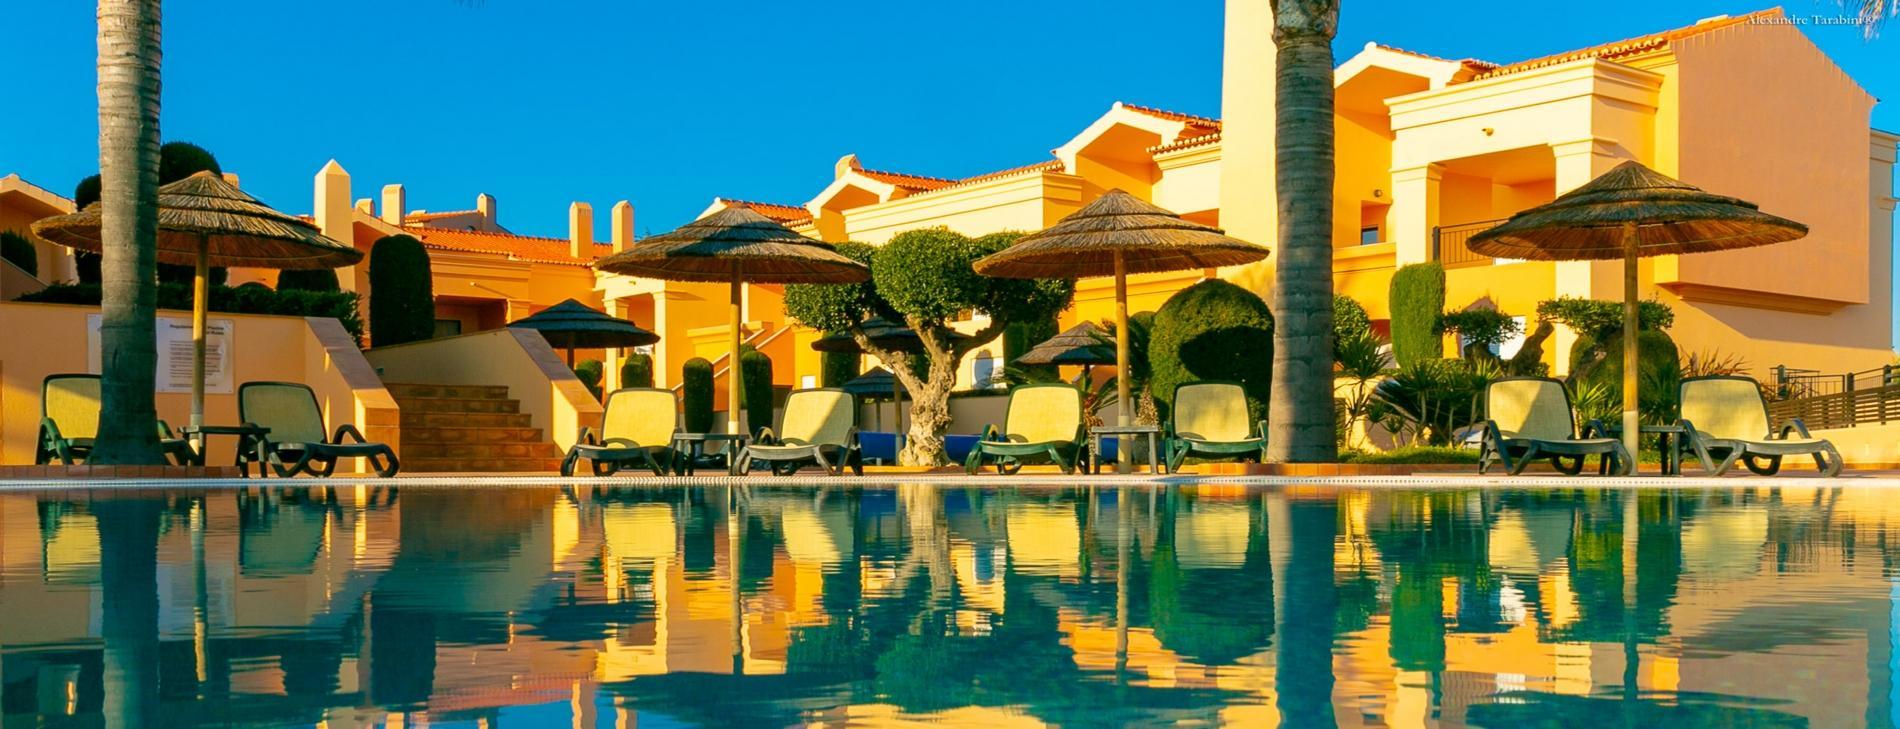 Ferienwohnung A24 - LuzBay Beach Apartment (2558091), Luz, , Algarve, Portugal, Bild 37